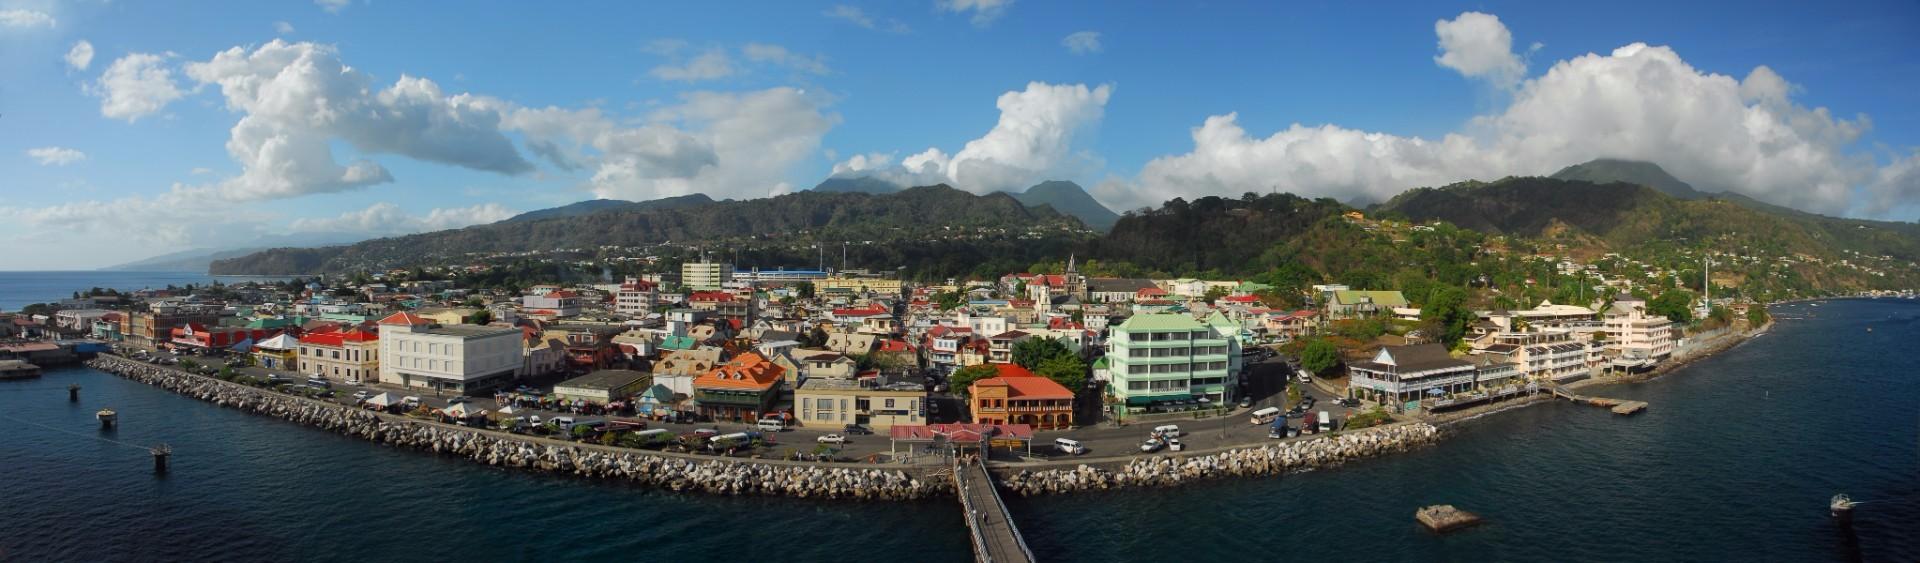 Dominica Population in 2017